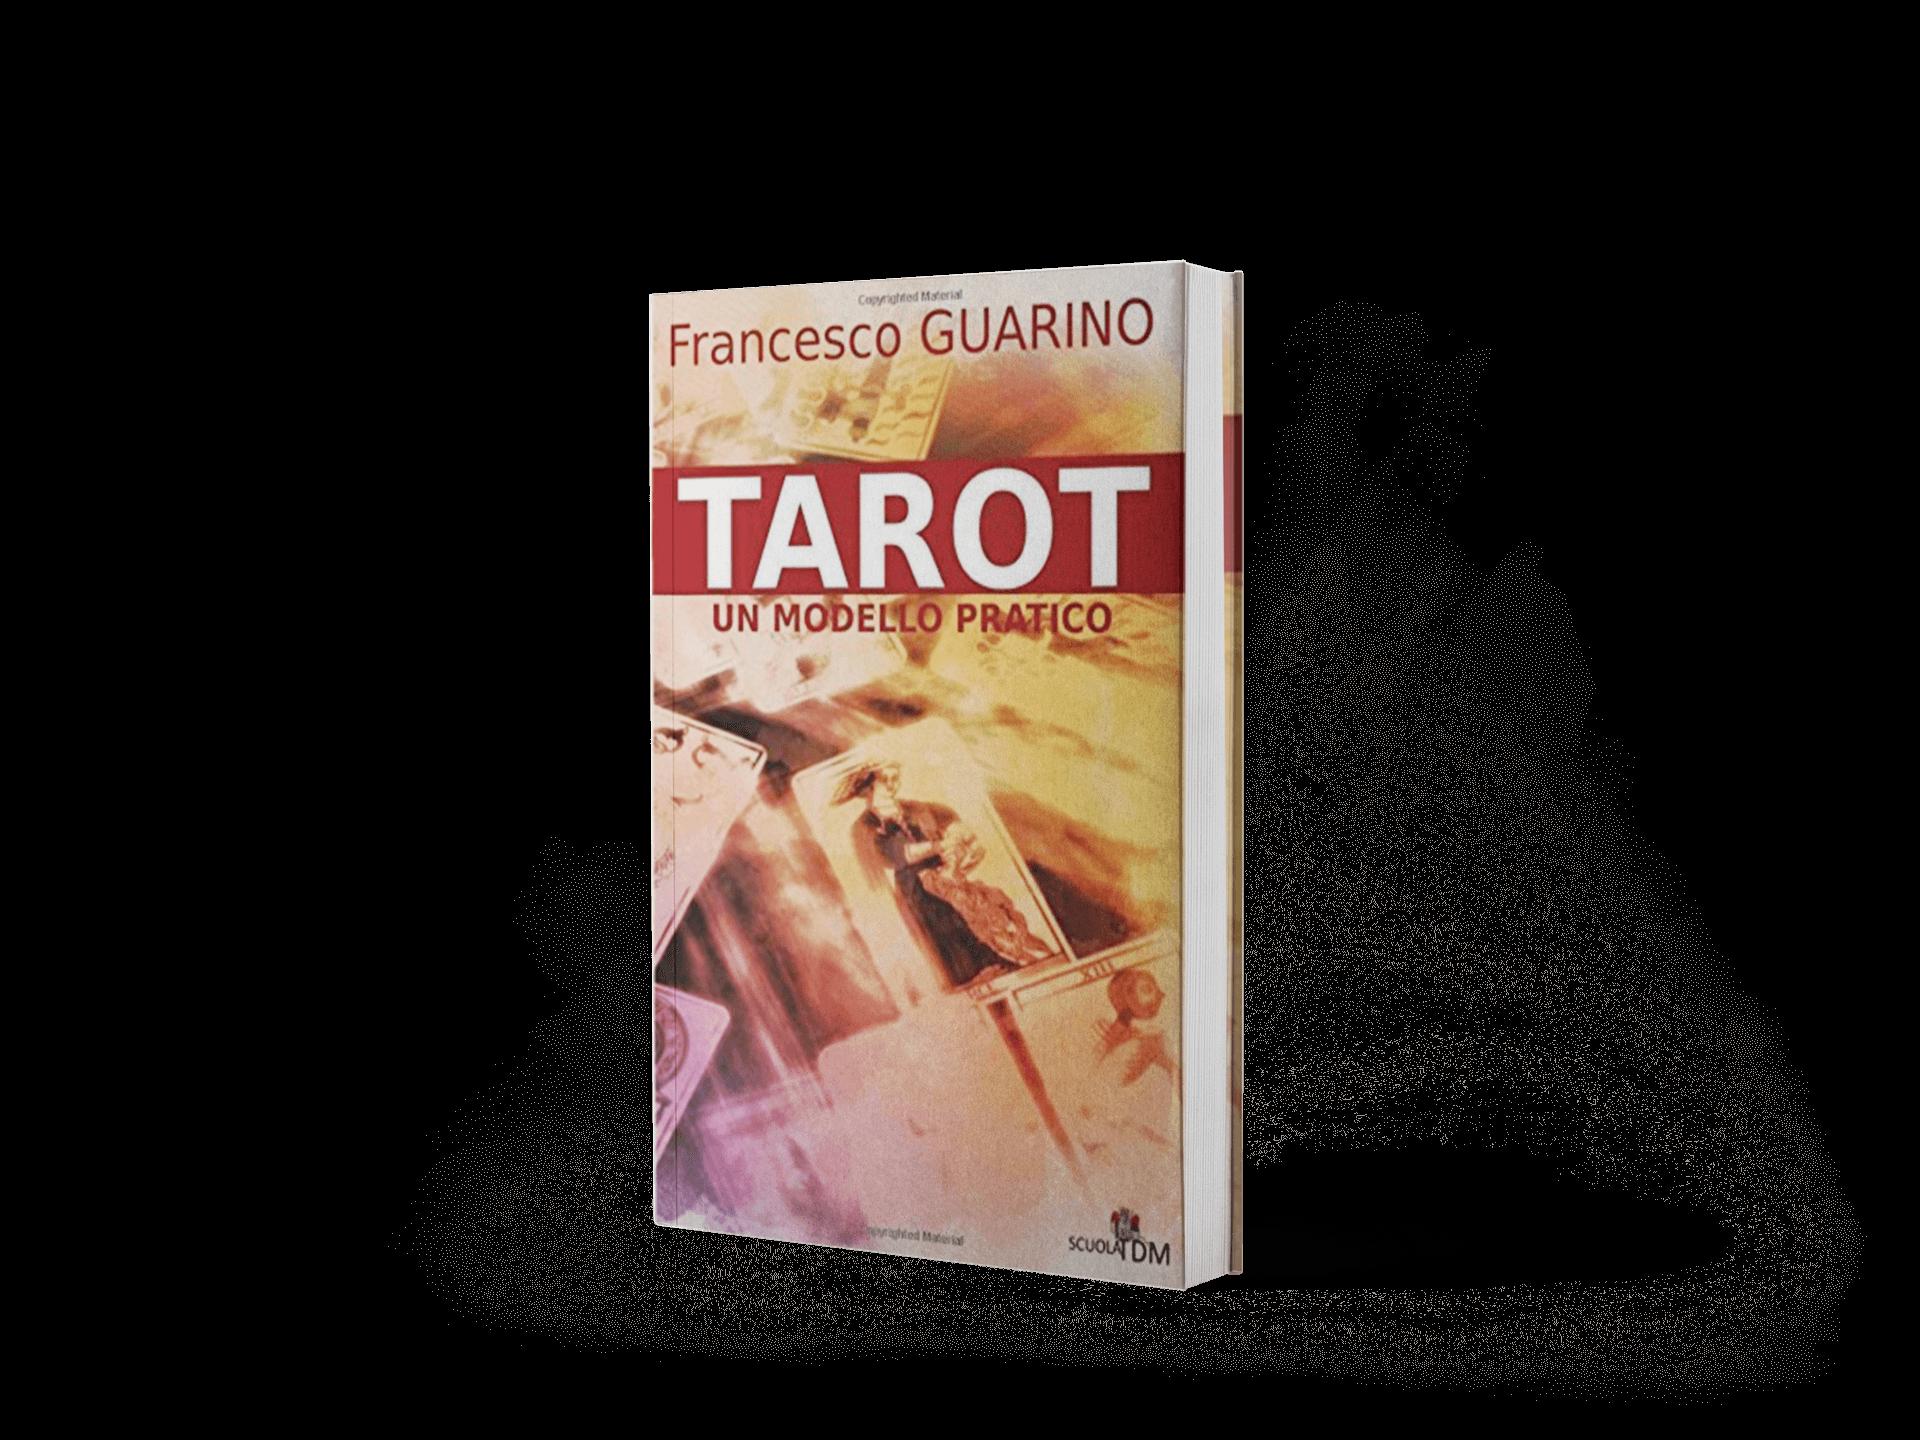 Tarot un modello pratico landing